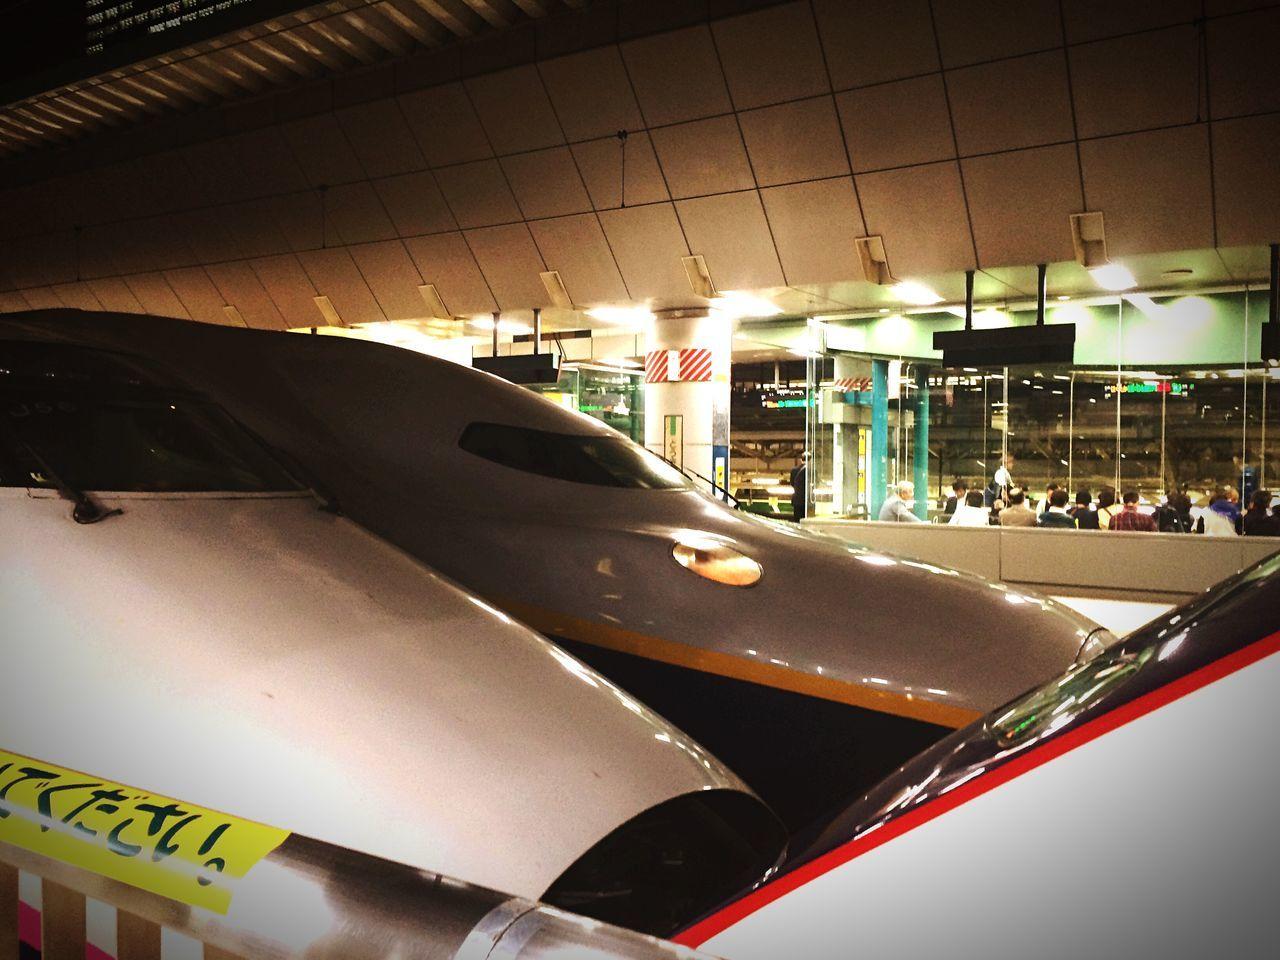 transportation, illuminated, mode of transport, public transportation, indoors, airplane, no people, night, close-up